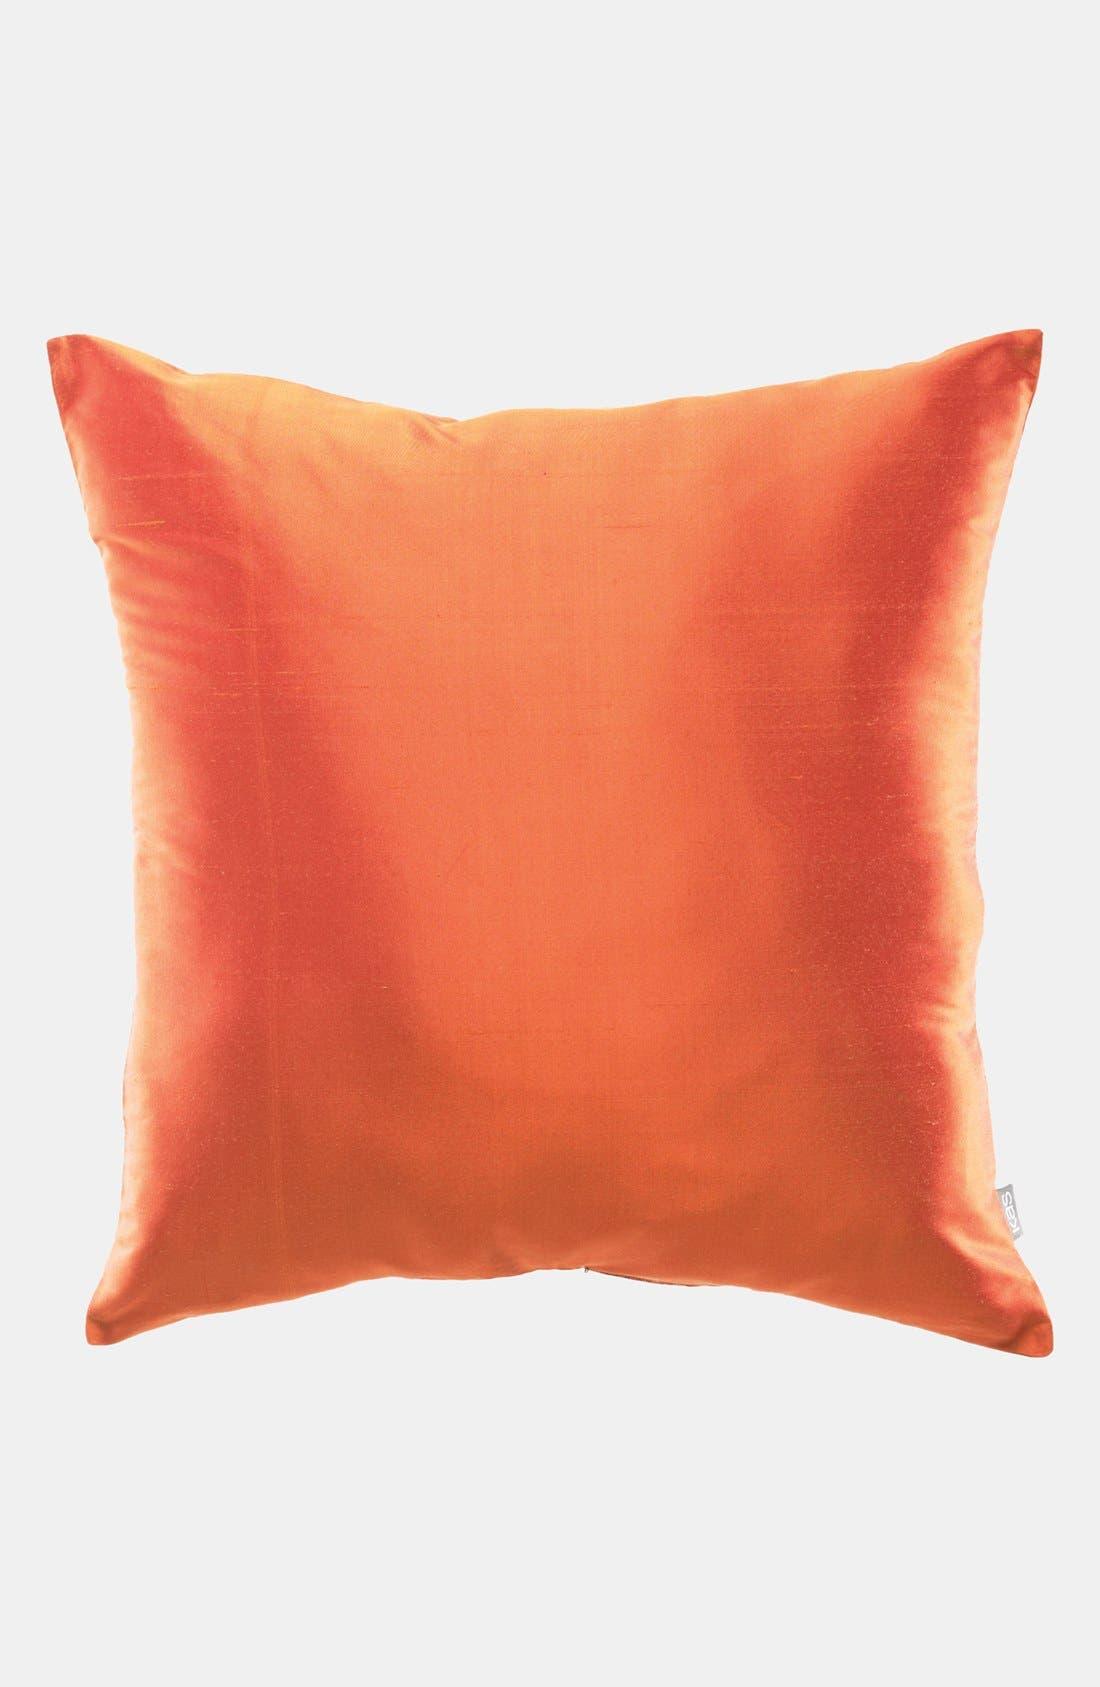 Alternate Image 1 Selected - KAS Designs 'Samara' Pillow (Online Only)